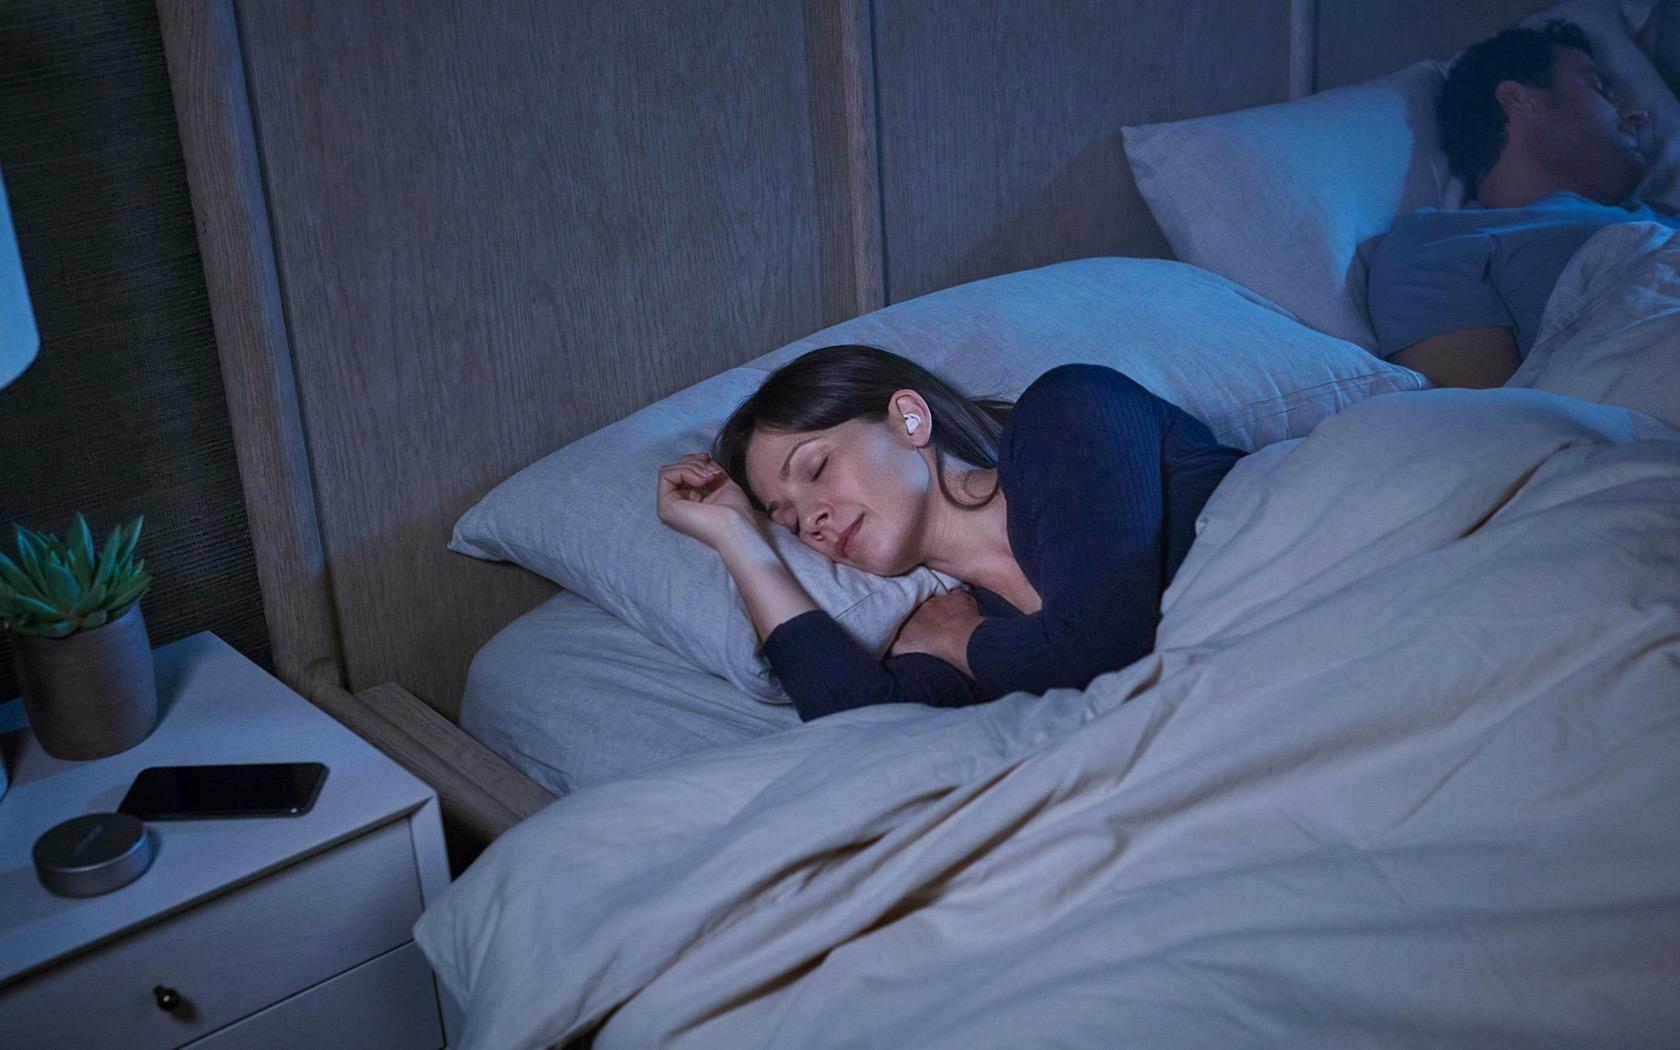 https://www.blog-nouvelles-technologies.fr/wp-content/uploads/2020/09/Bose_Sleepbuds_II_2089_8.jpg